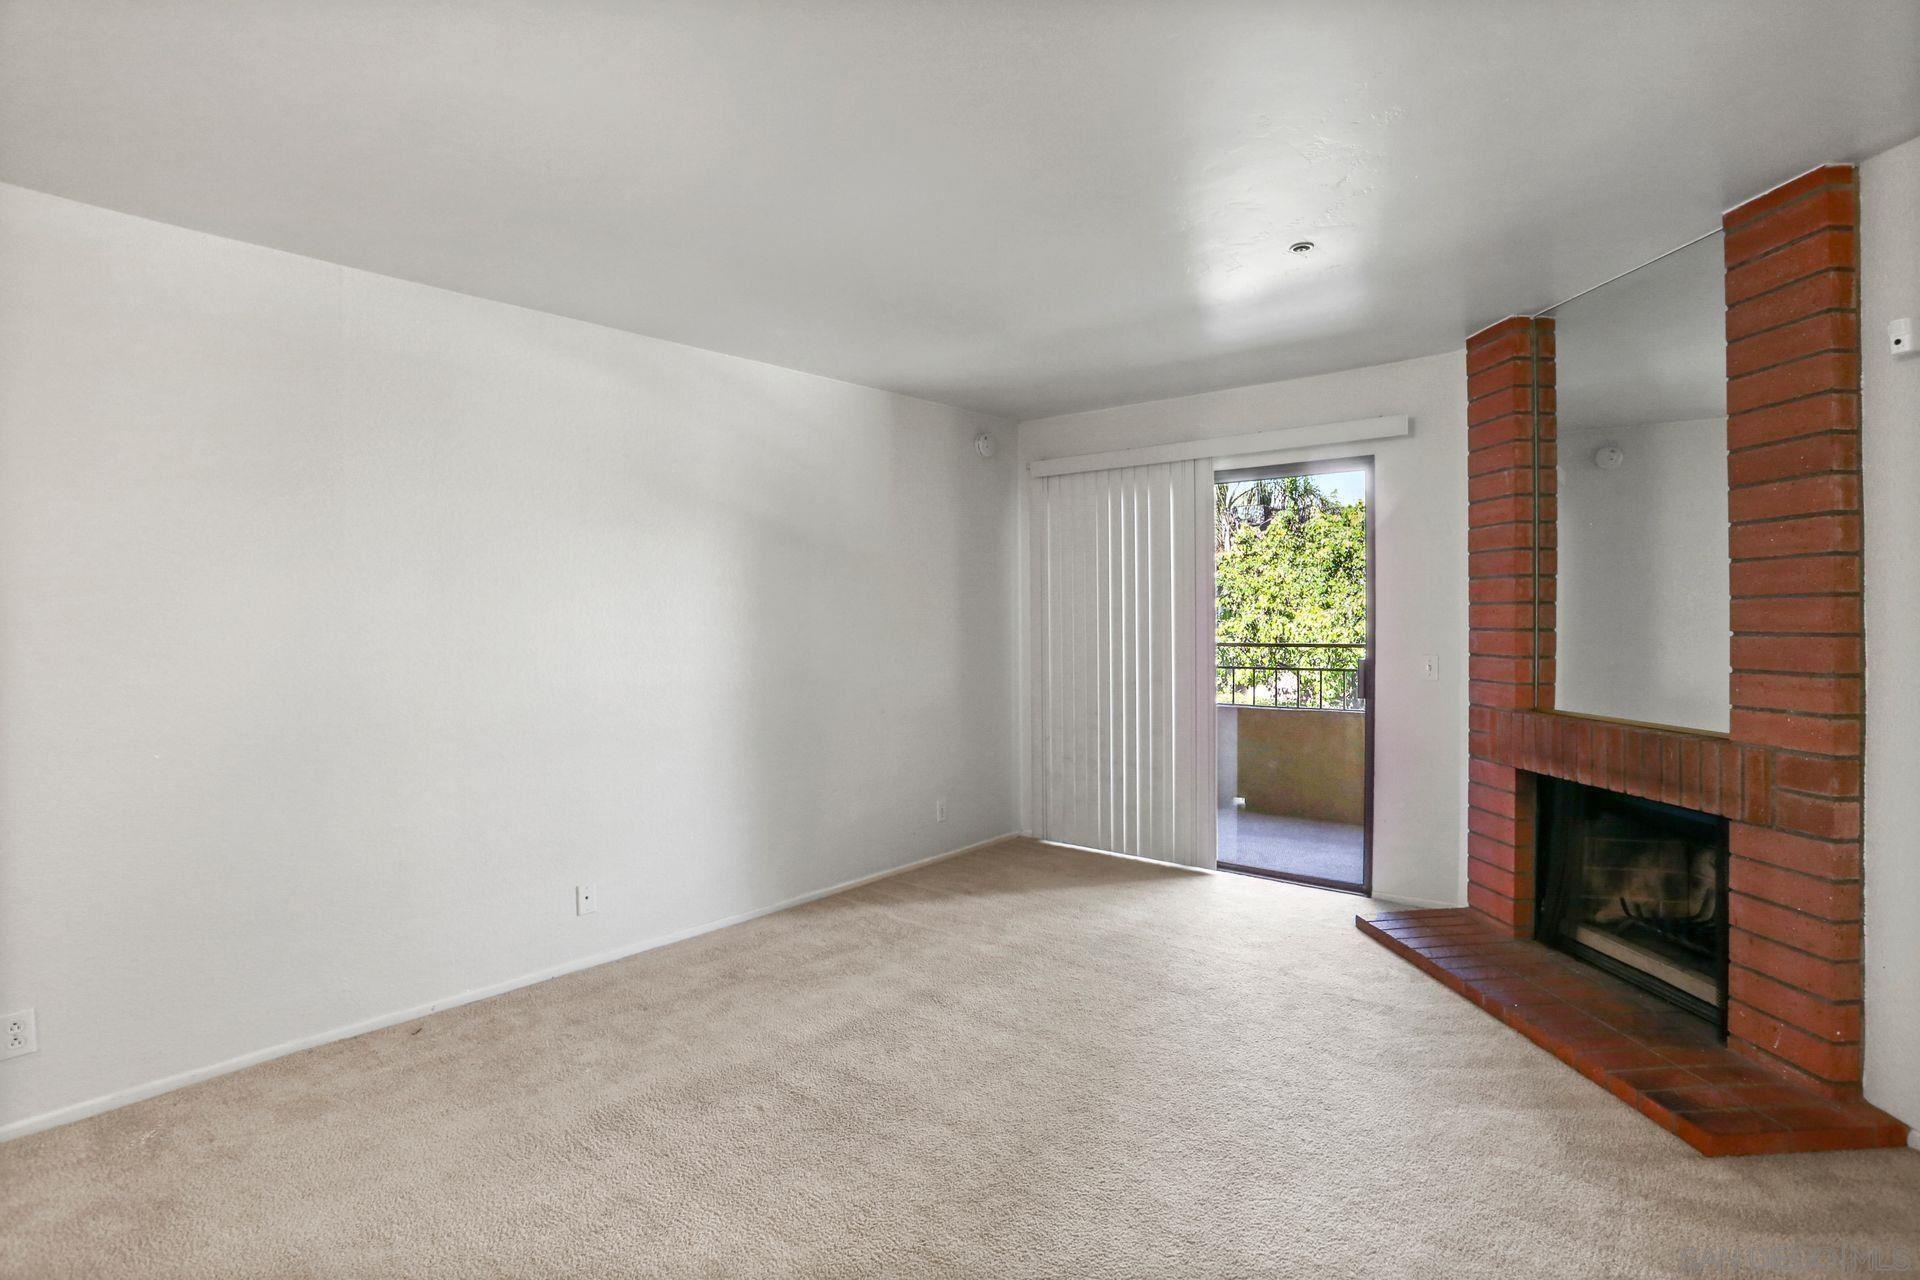 Photo of 5649 Lake Park Way #106, La Mesa, CA 91942 (MLS # 210011535)